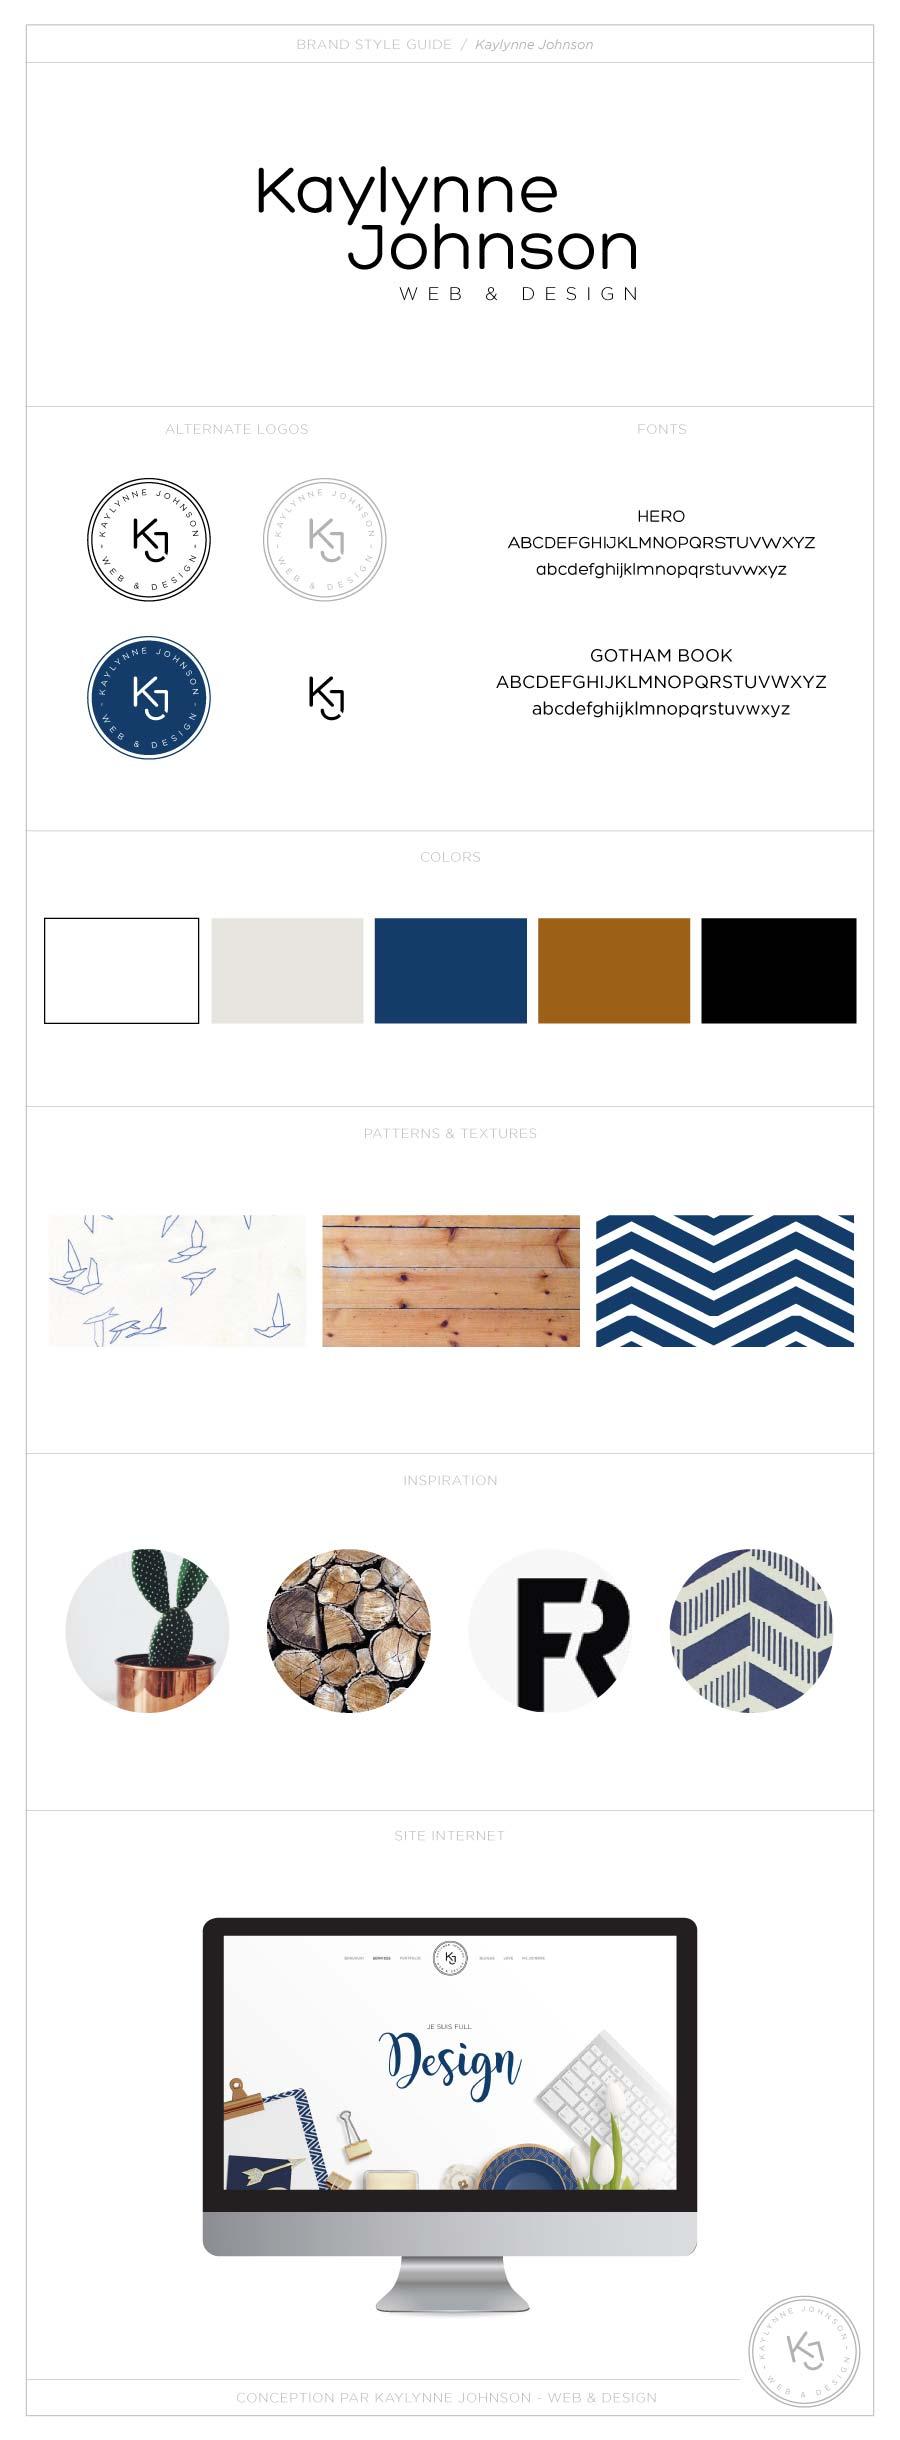 Branding board Kaylynne Johnson | Design by Kaylynne Johnson - web & design